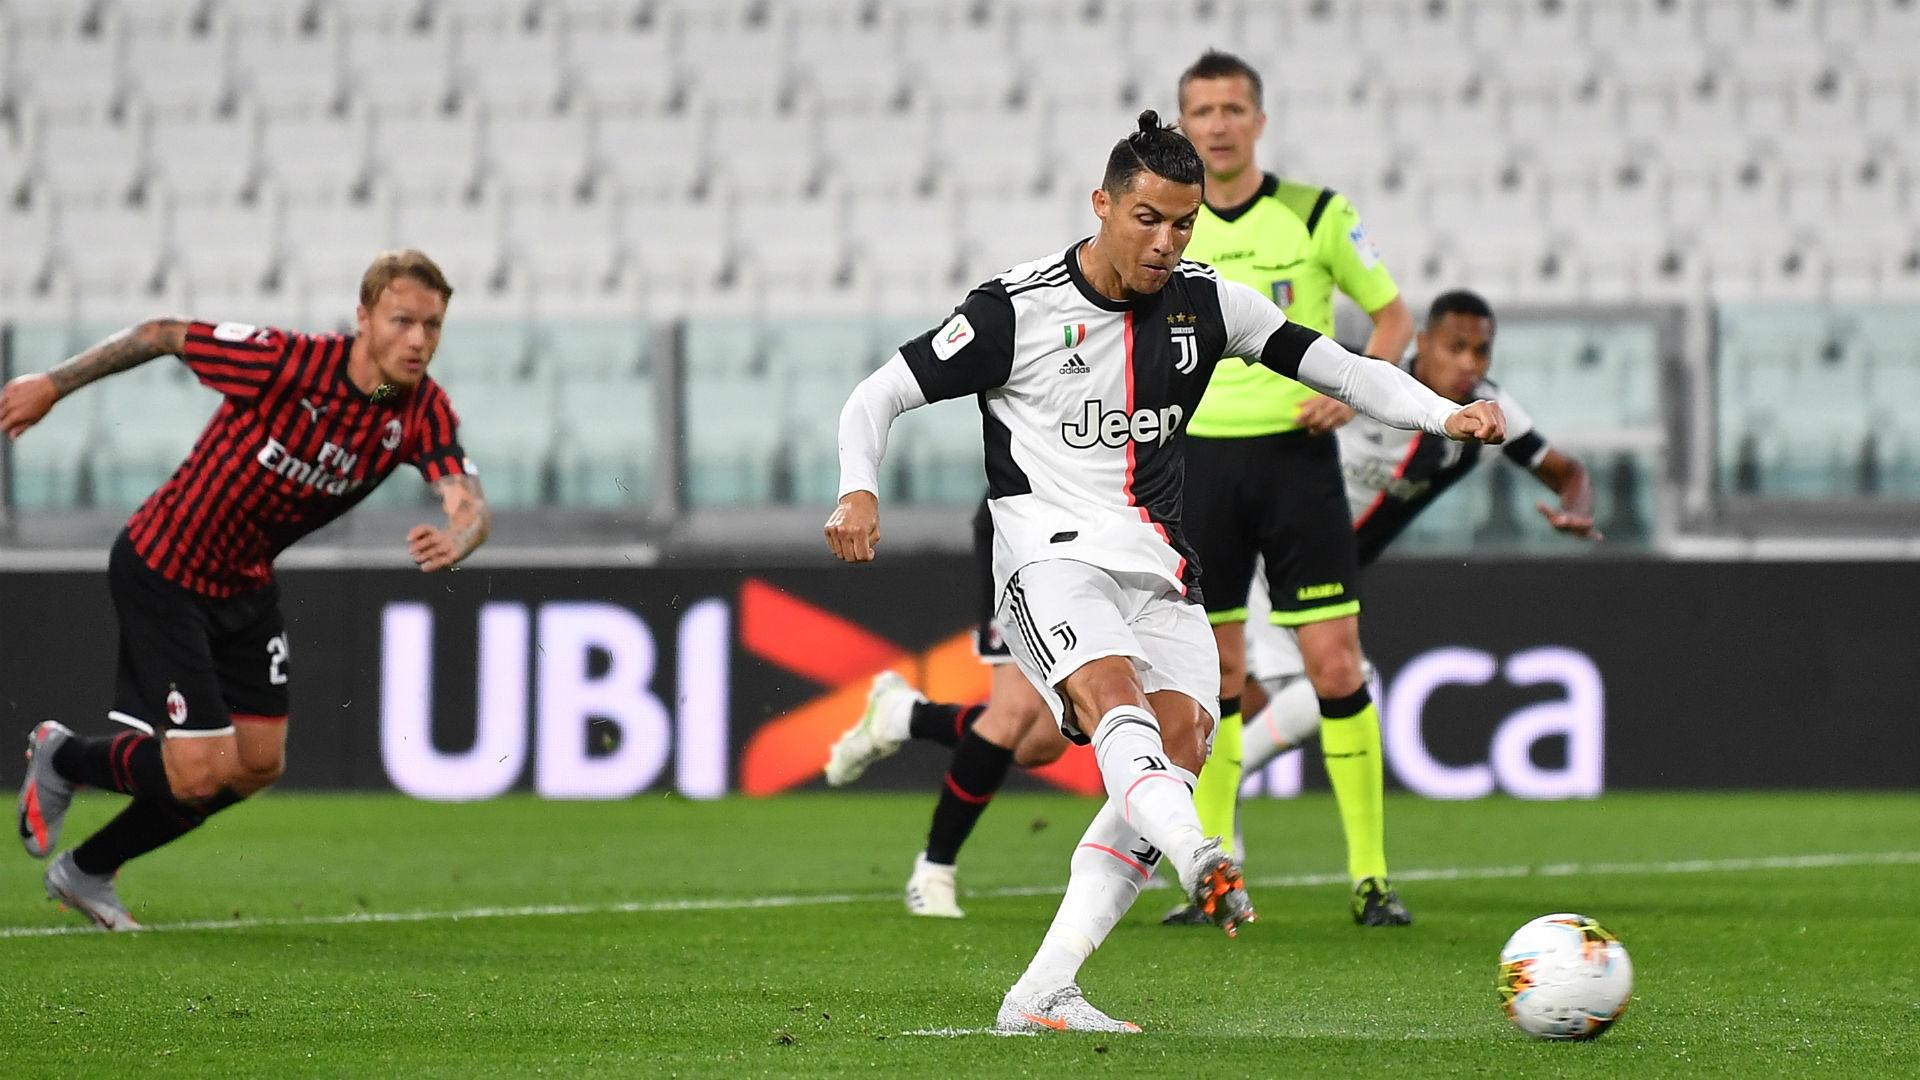 'Even the greatest miss penalties' – Bonucci defends Juventus team-mate Ronaldo